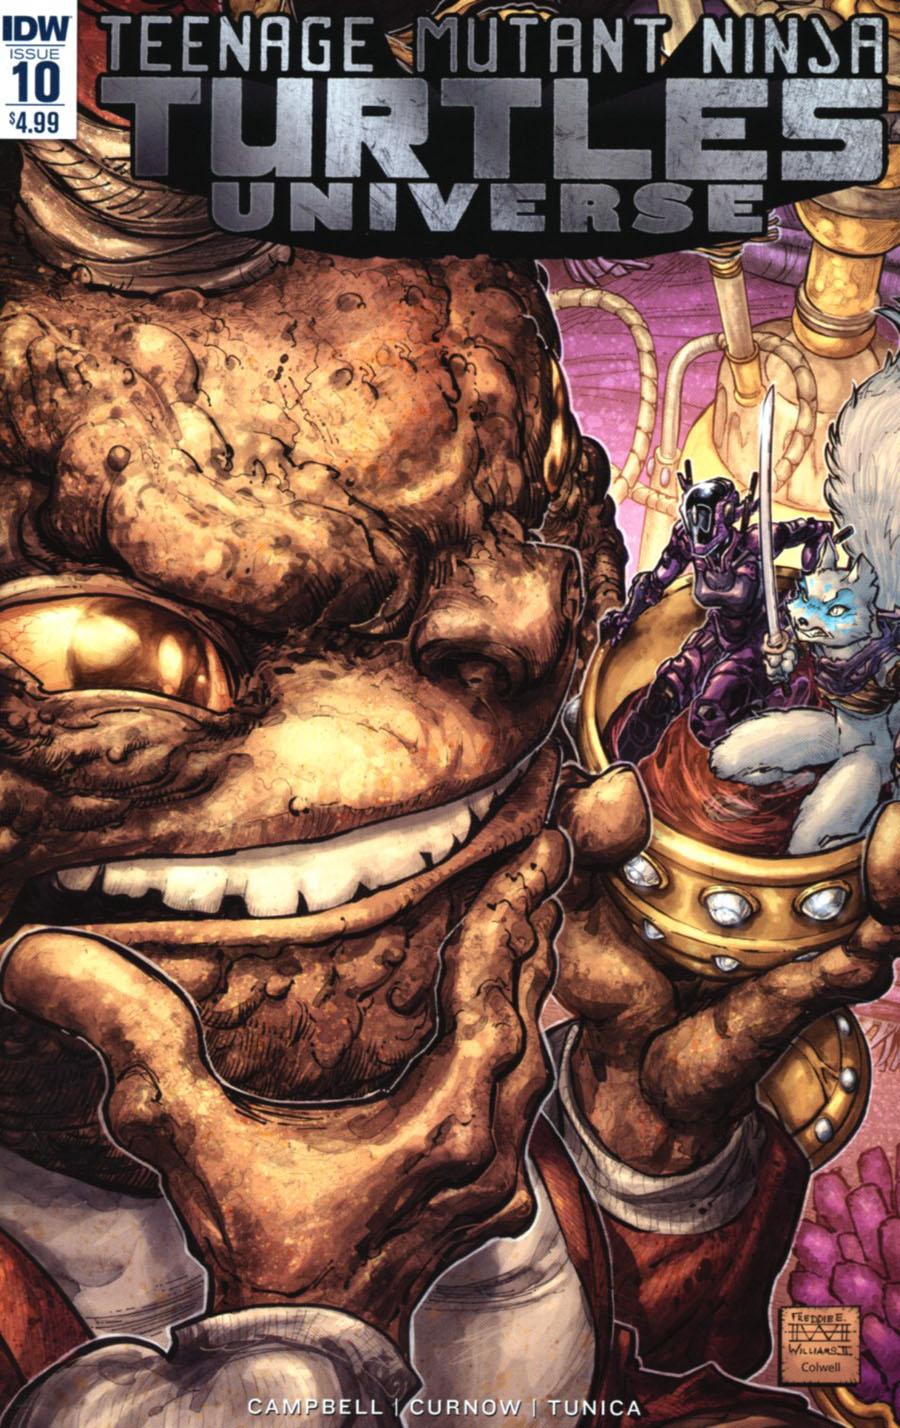 Teenage Mutant Ninja Turtles Universe #10 Cover A Regular Freddie Williams II Cover